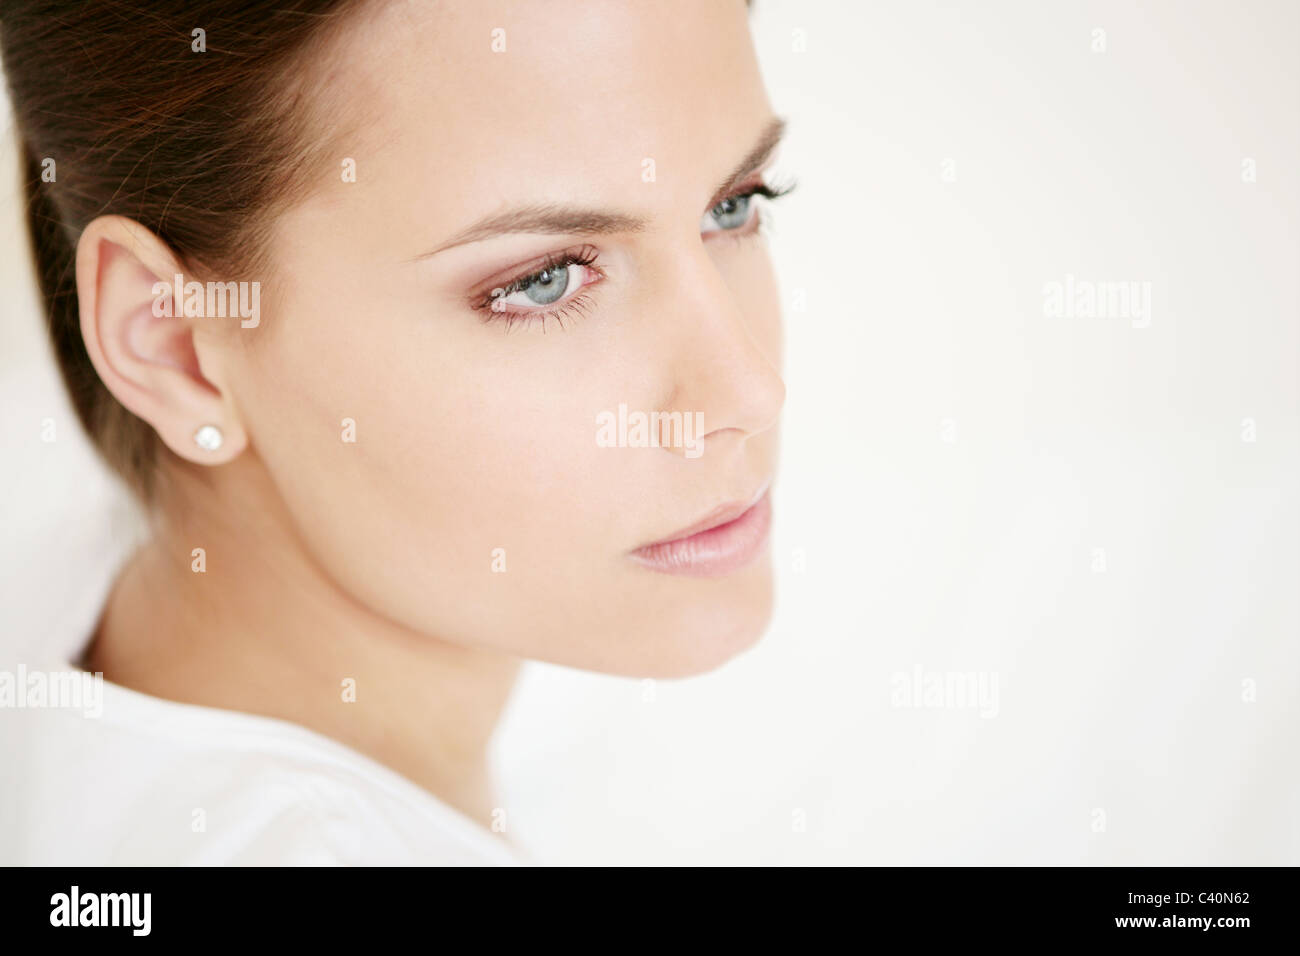 Cara, joven, mujer, vitalidad, fresco, maquillaje, modelo adulto, hembra, cabeza, belleza, de 20-25 años, 18 Imagen De Stock